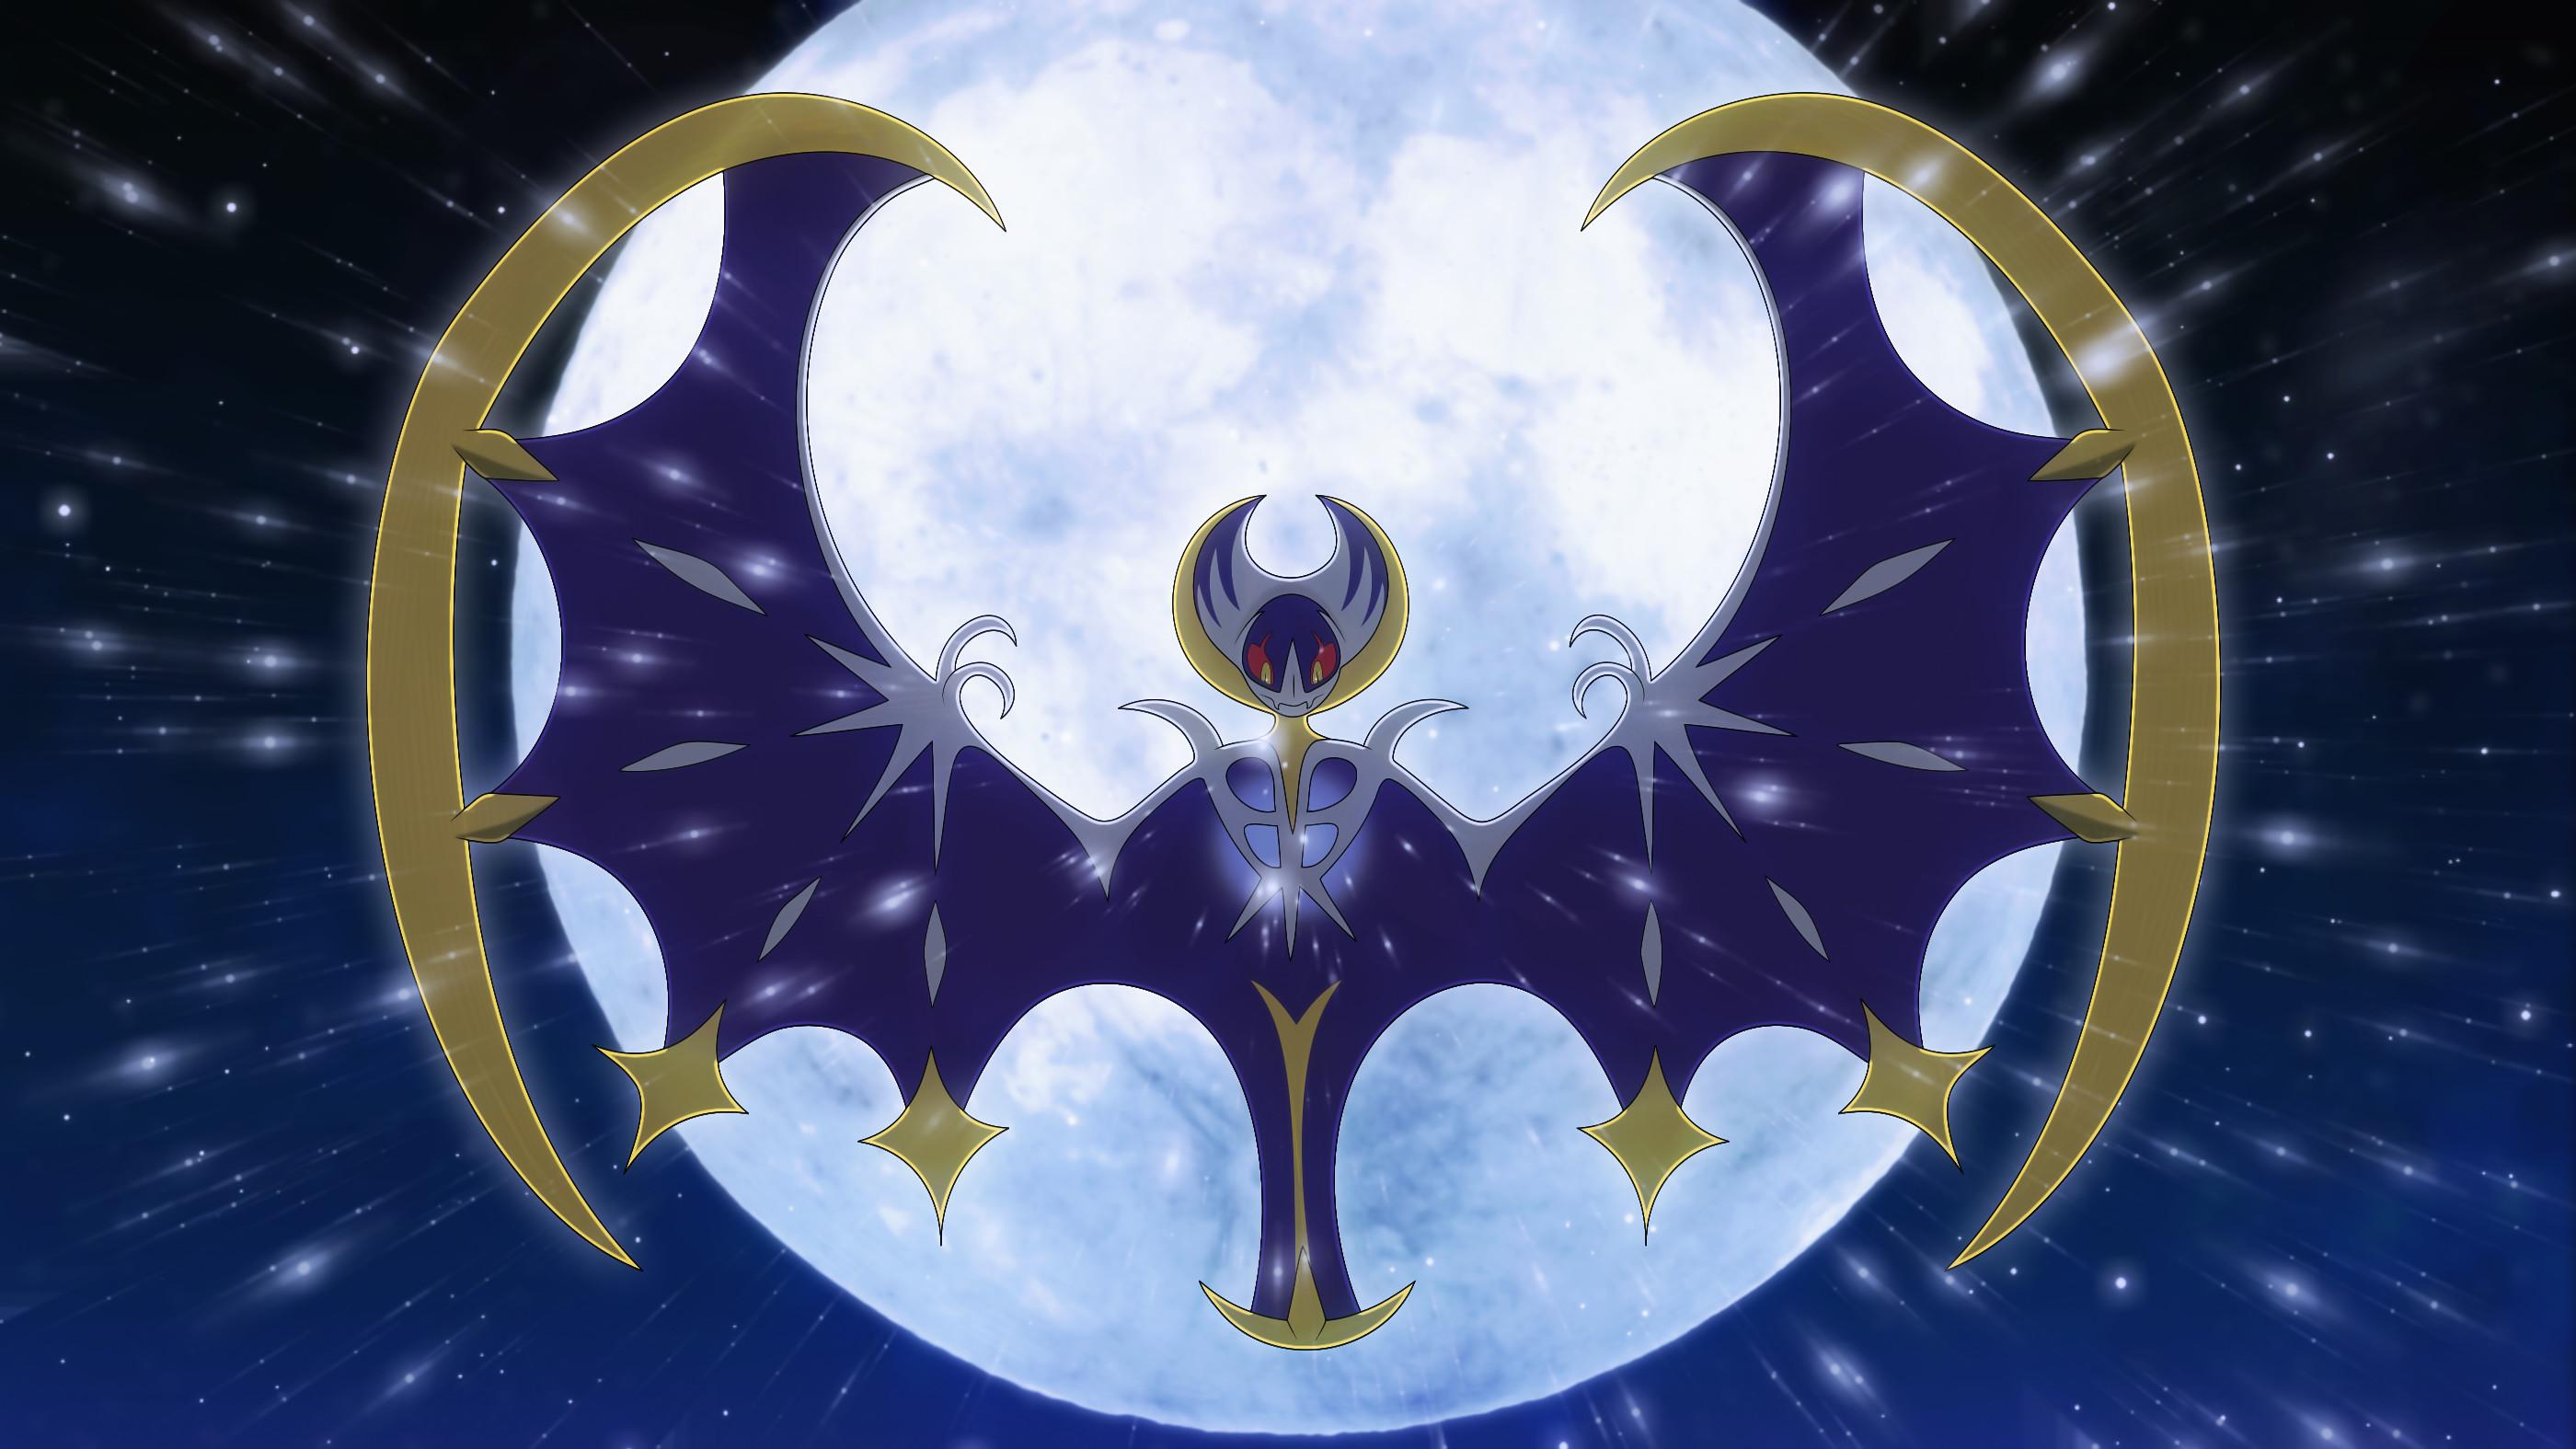 Video Game РPok̩mon Sun and Moon Lunala (Pok̩mon) Pok̩mon Pok̩mon Moon  Wallpaper